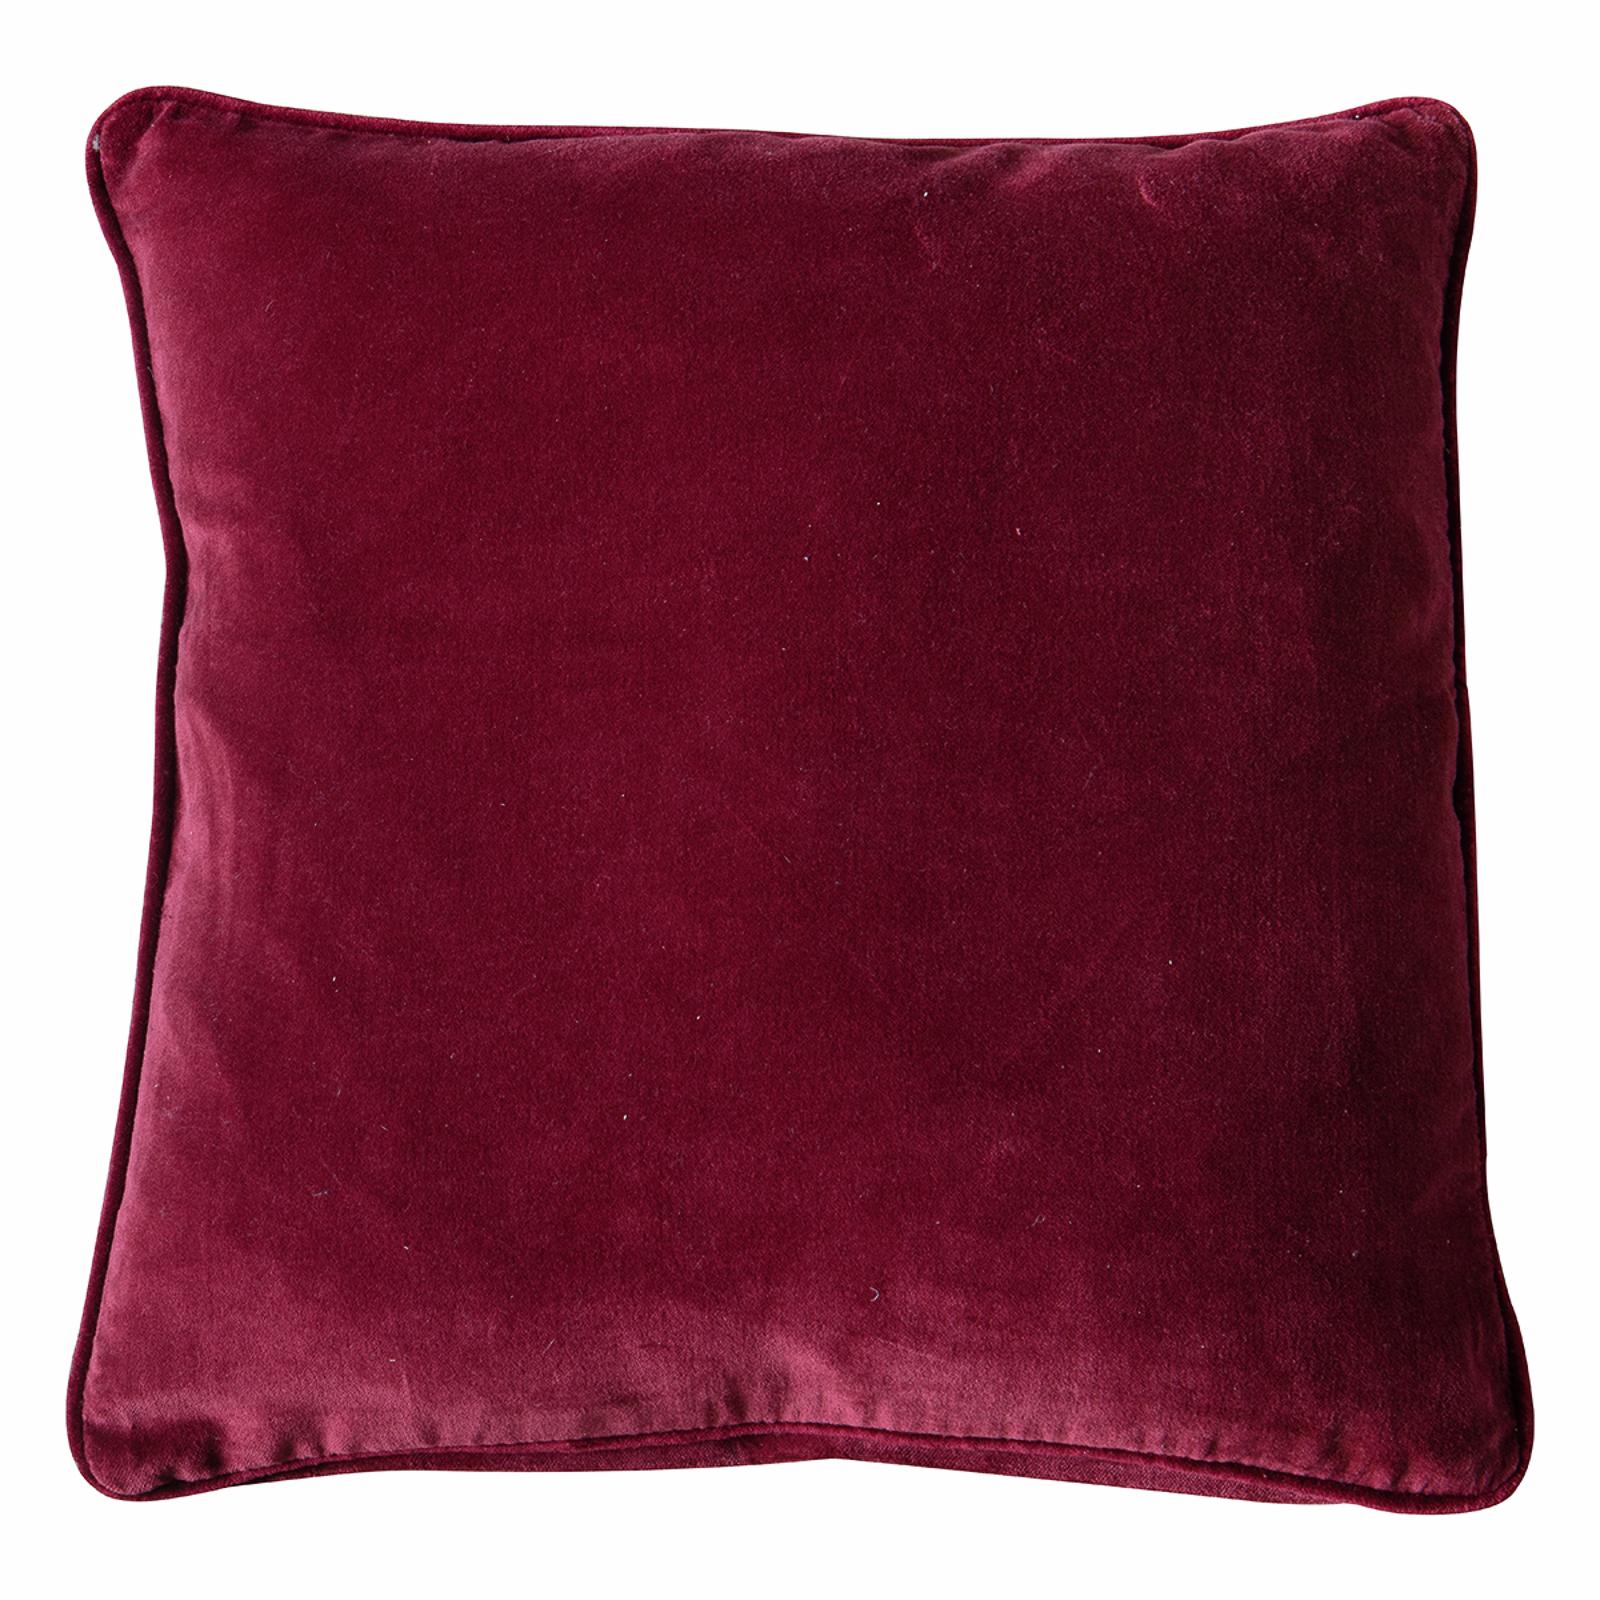 Ella 450 x 450mm Claret Velvet Cushion